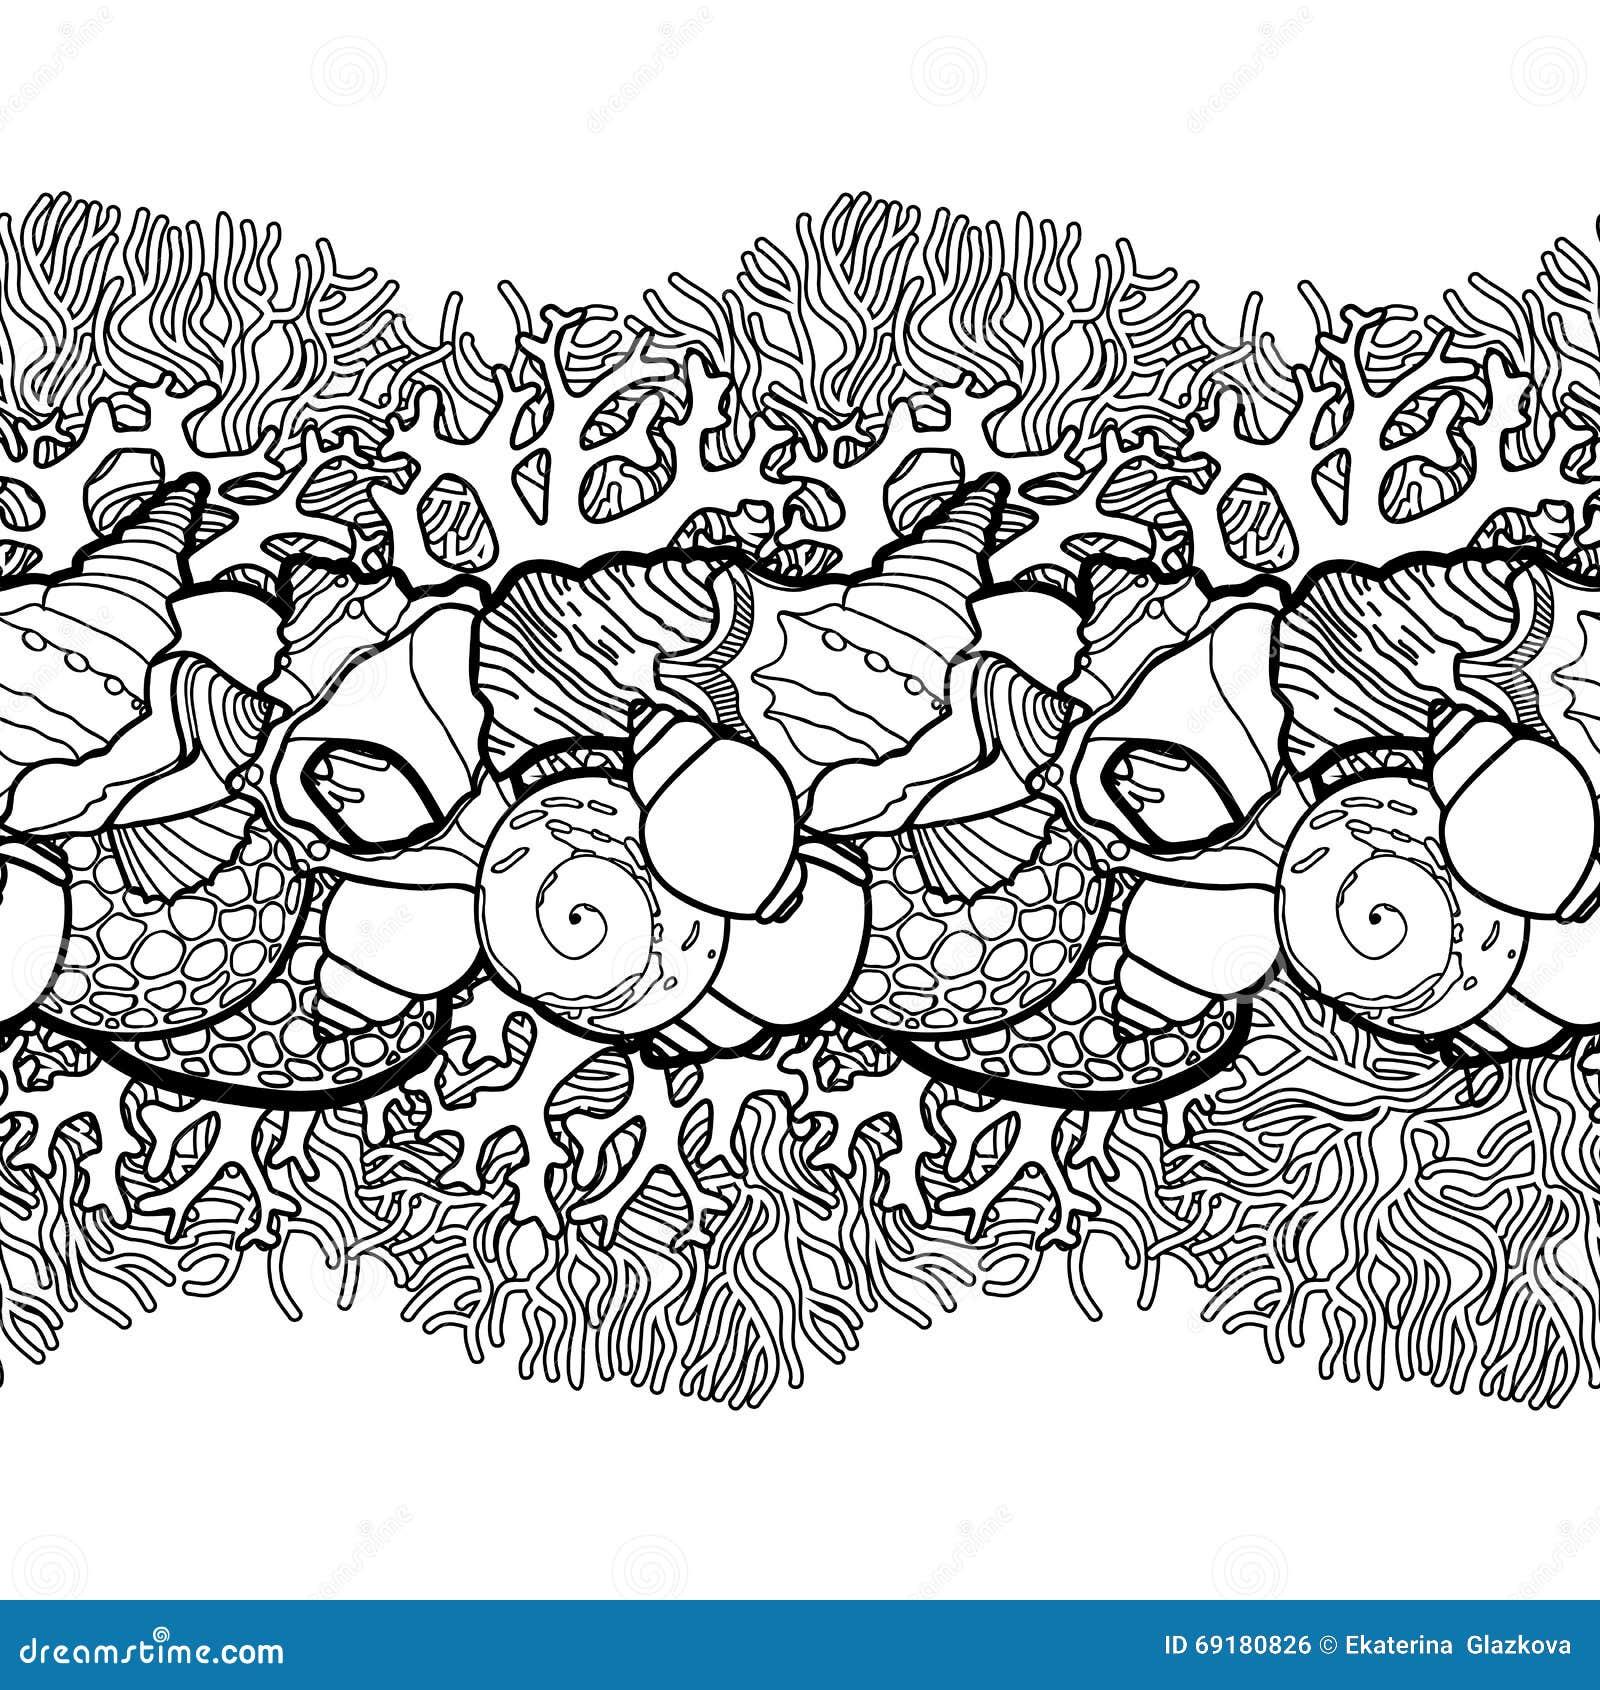 Download Graphic Seashells Border Stock Vector Illustration Of Ocean